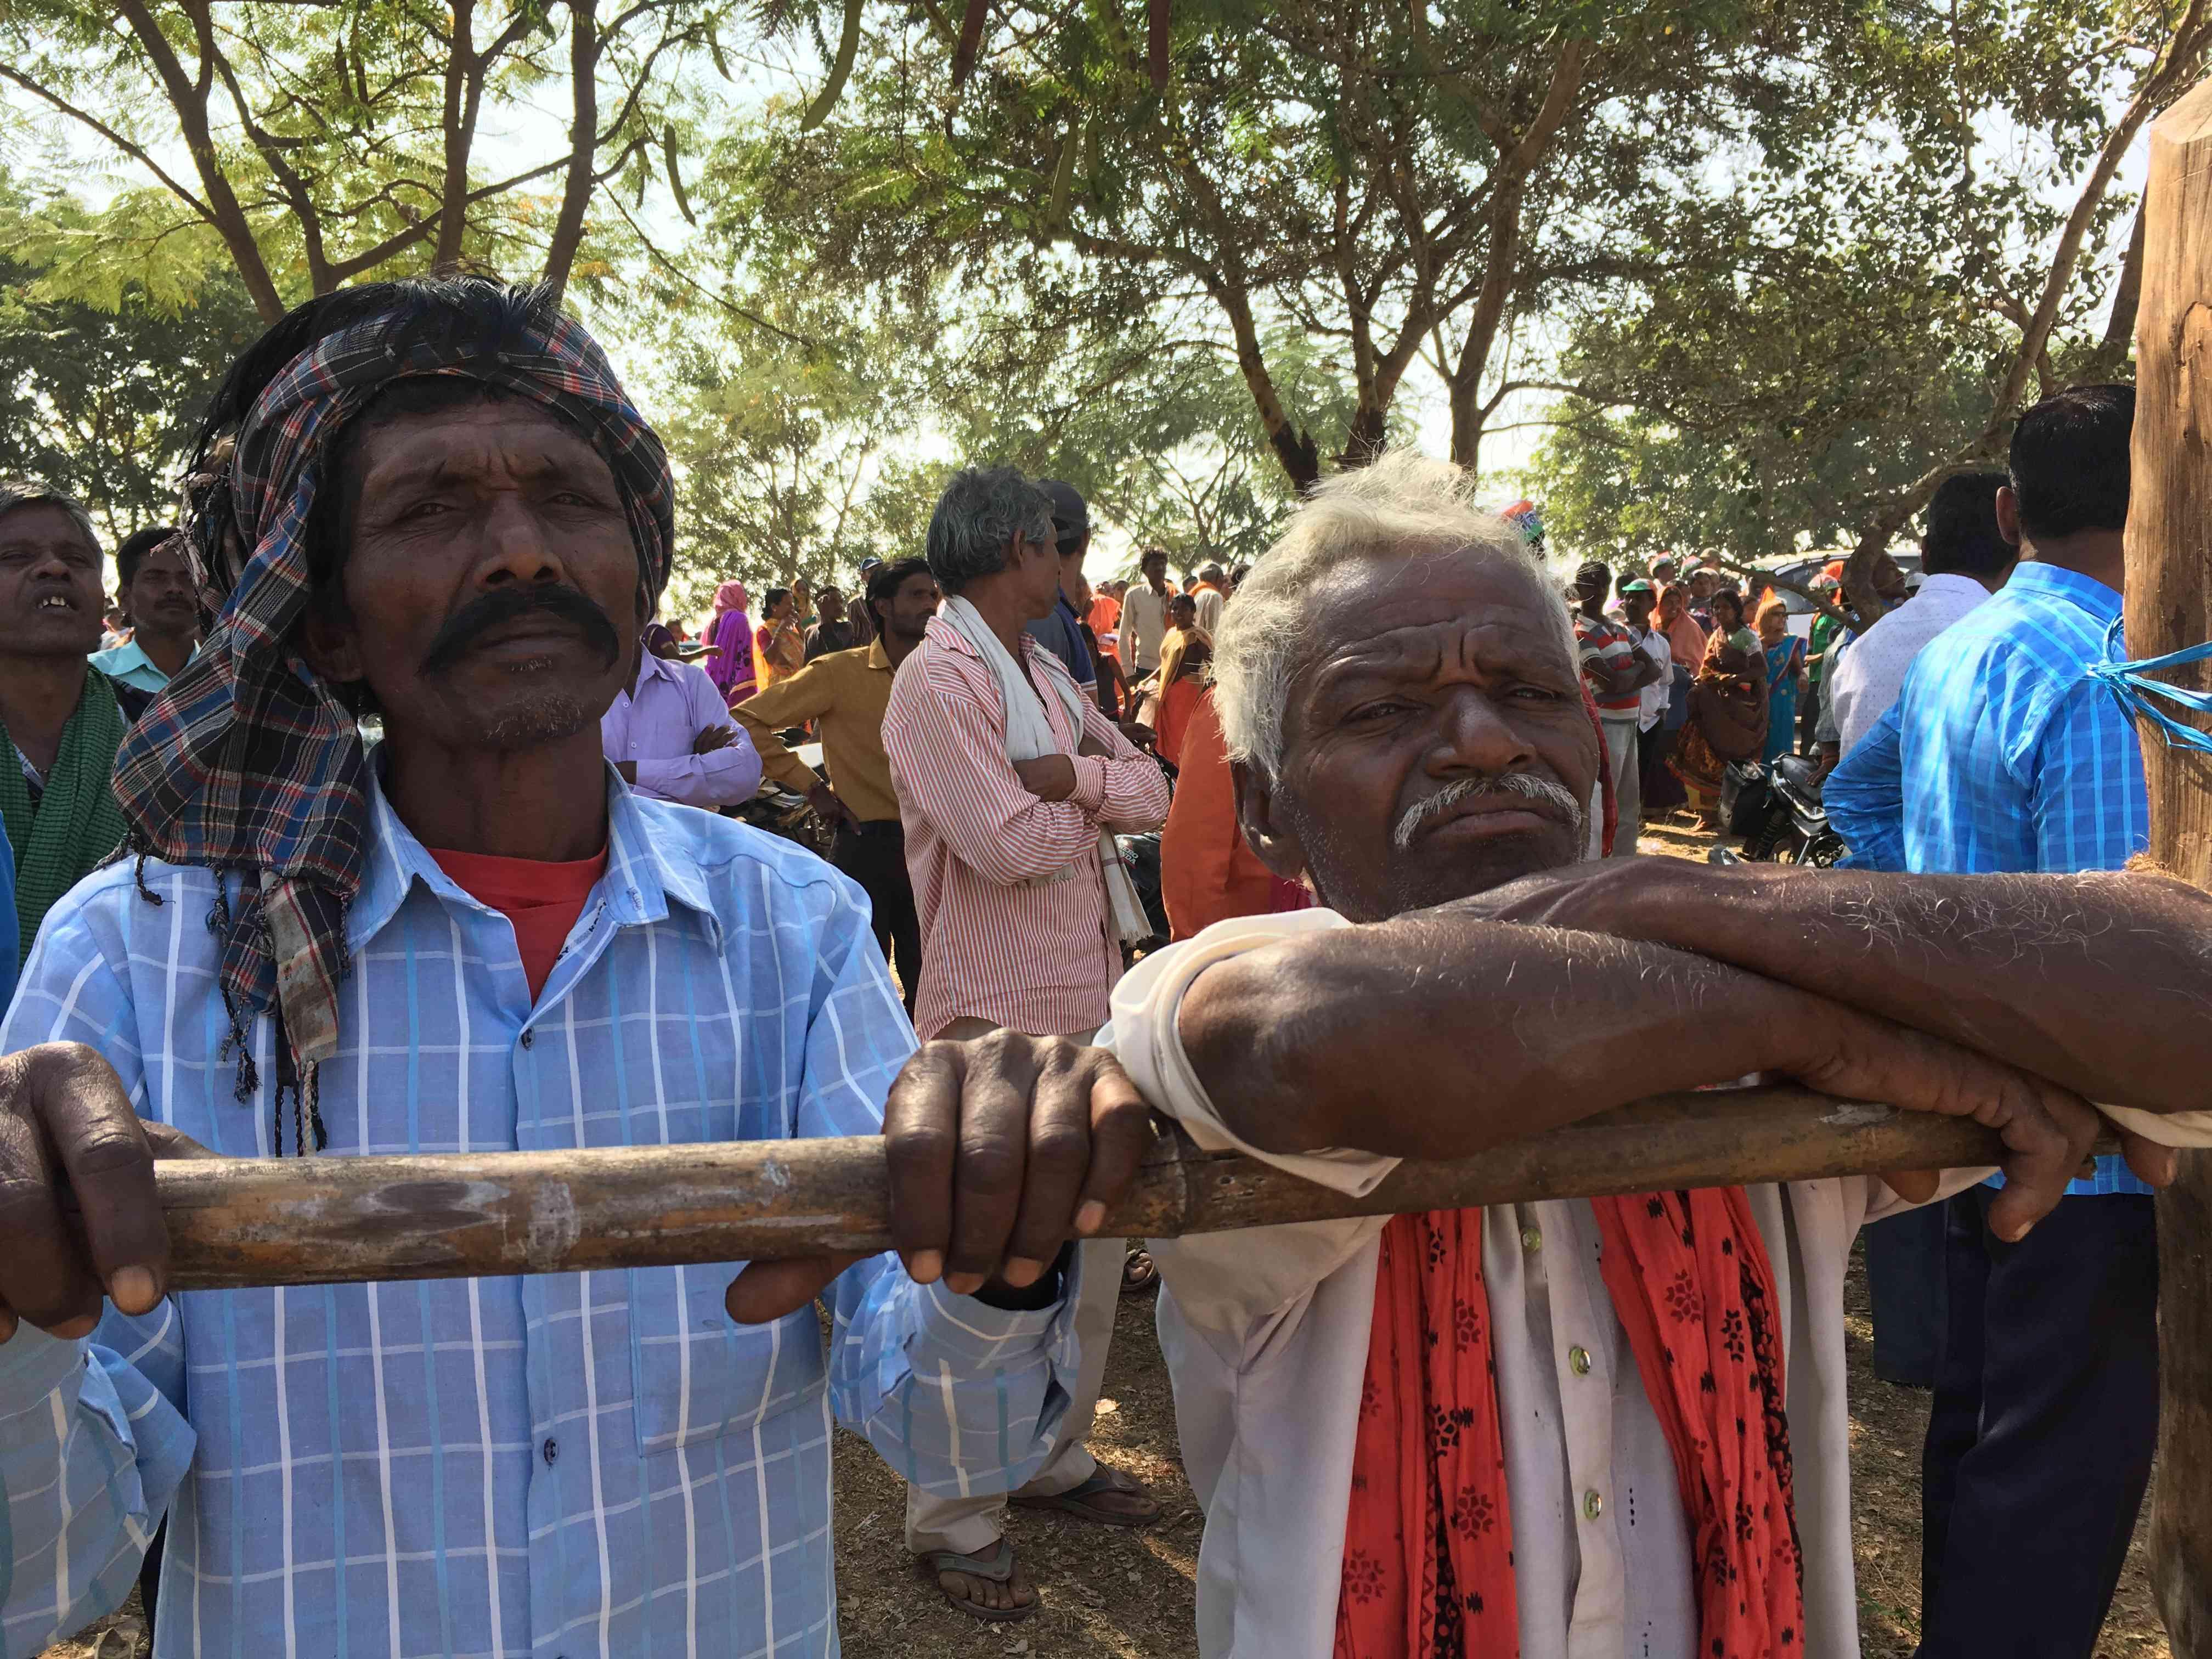 Daulat Ram Guru, a cultivator from Nayapara village, said farming has become unviable in Mahasamund. Photo credit: Akash Bisht